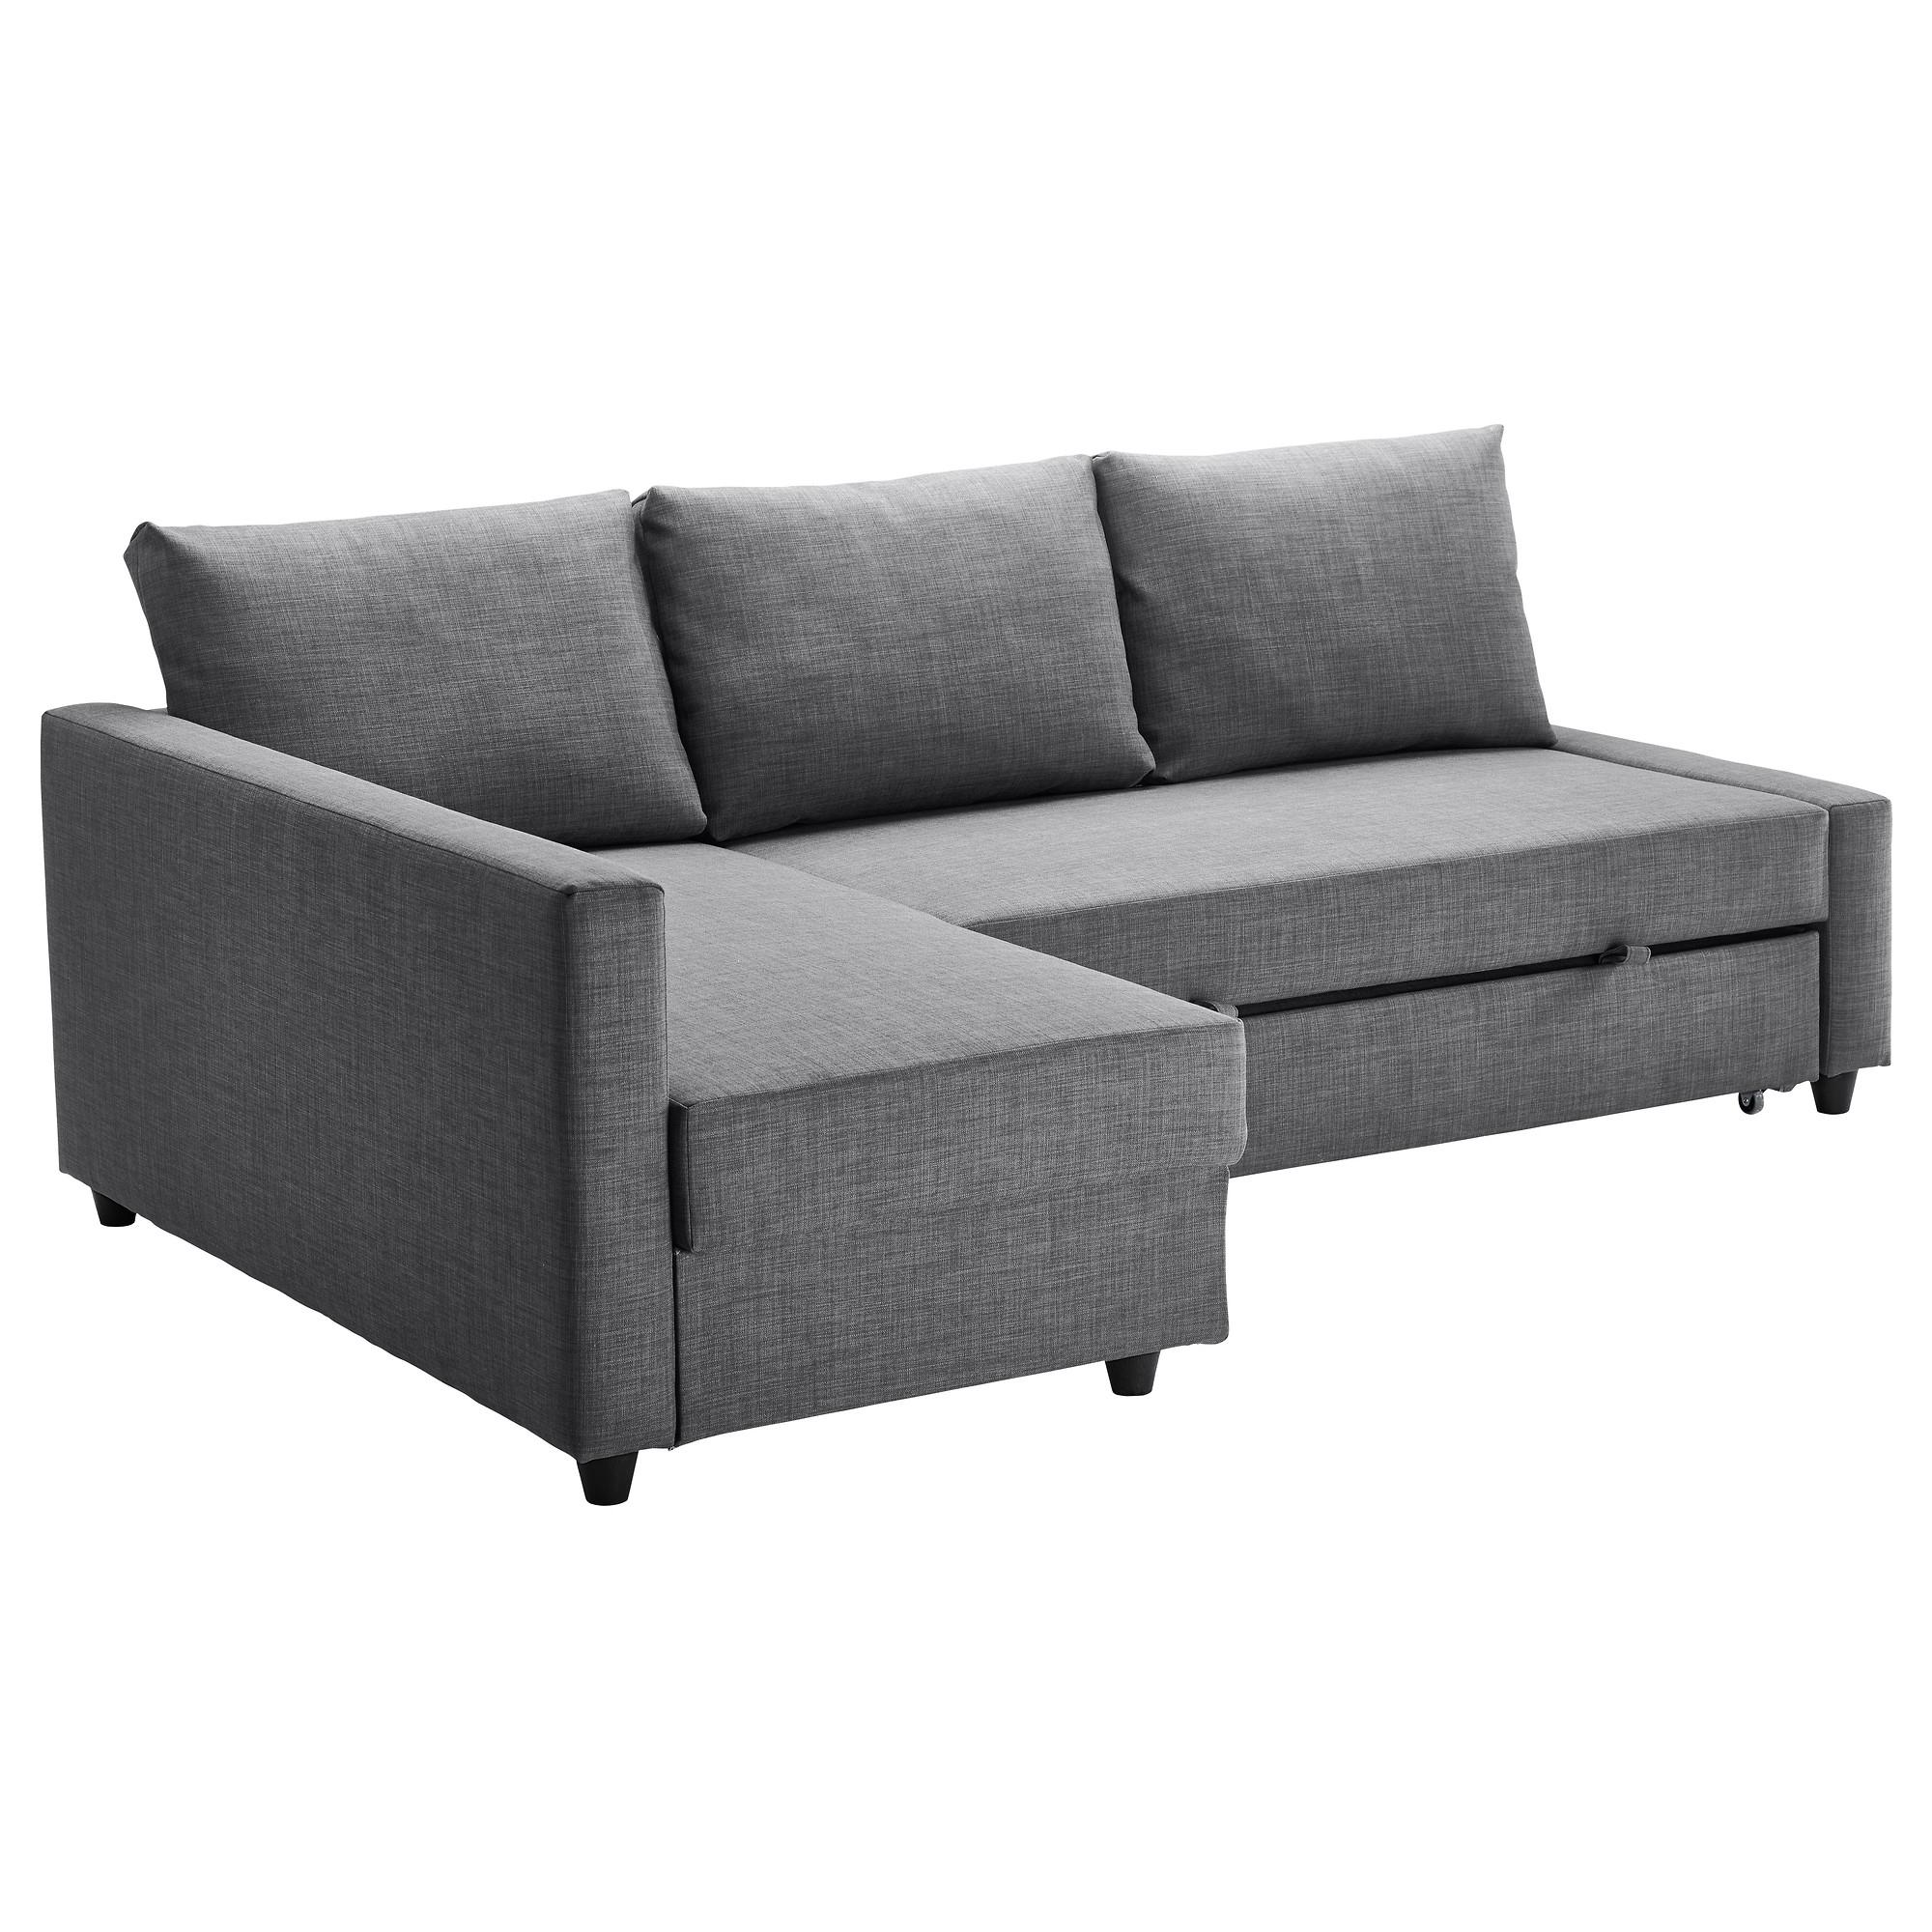 Fashionable Friheten Corner Sofa Bed With Storage – Skiftebo Dark Gray – Ikea With Regard To Ikea Corner Sofas With Storage (View 3 of 15)